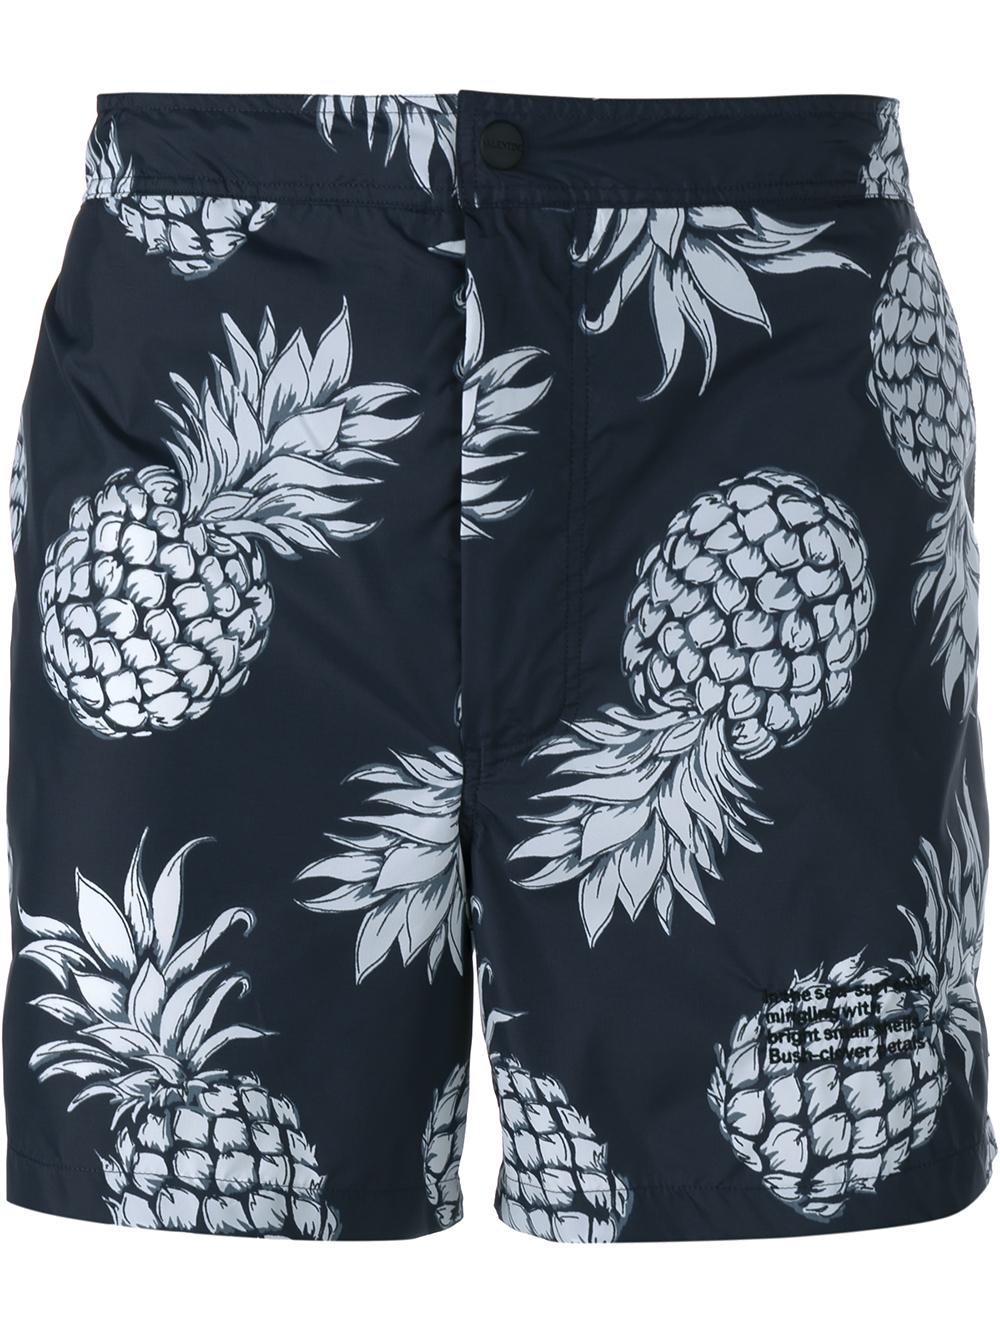 21b158a18fb2c Valentino Pineapple-print Swim Shorts in Black for Men - Lyst